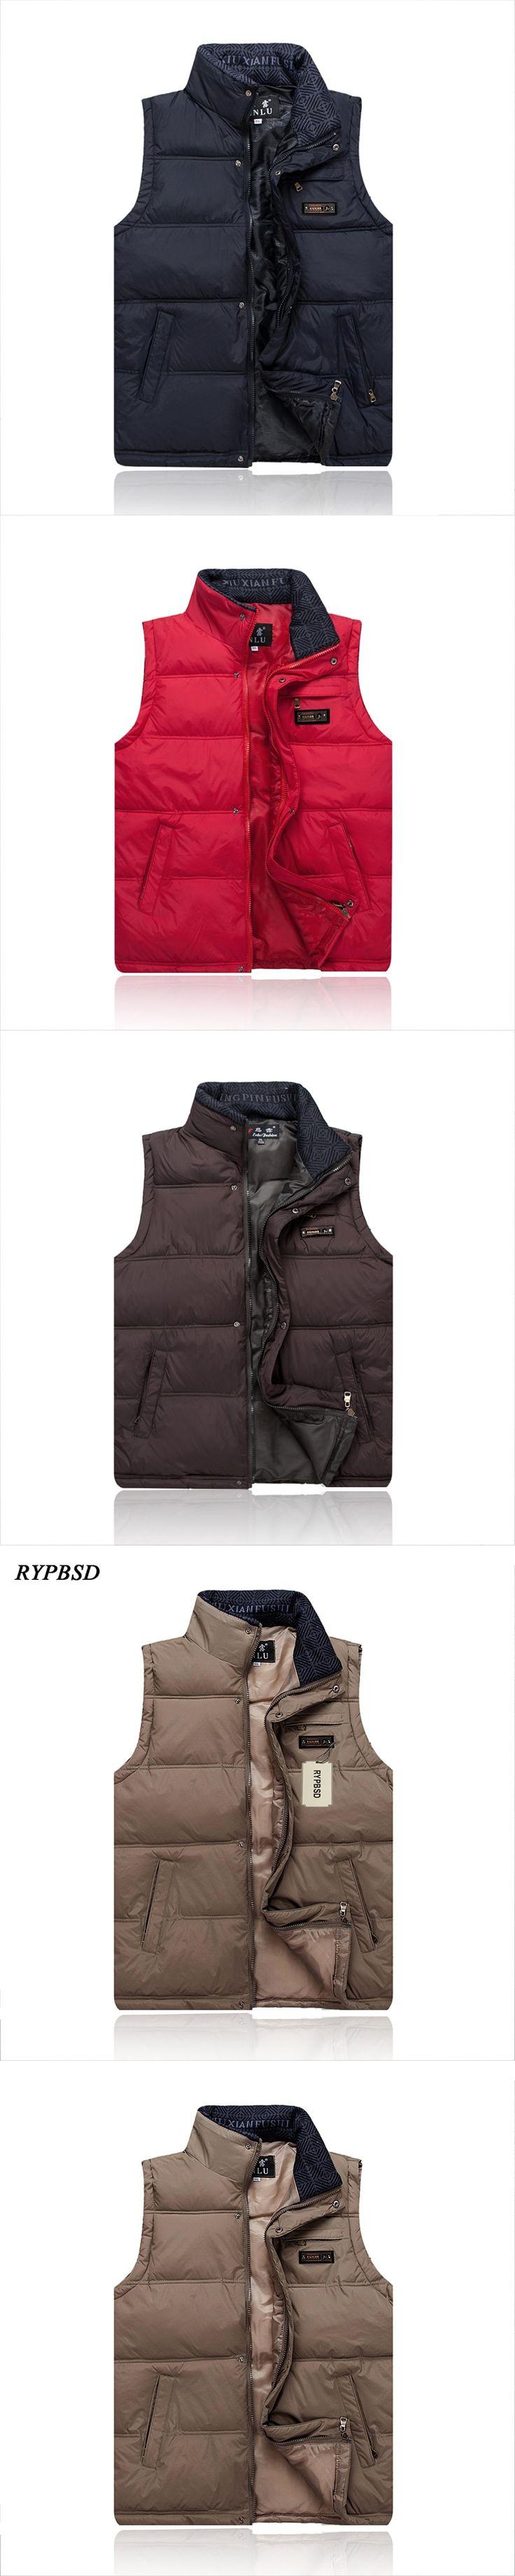 SXXXXL Autumn and Winter New Leisure Men's Down Jacket Vest Stand Collar Waistcoat Sleeveless Vest Men Cotton Mens Outdoors Vest